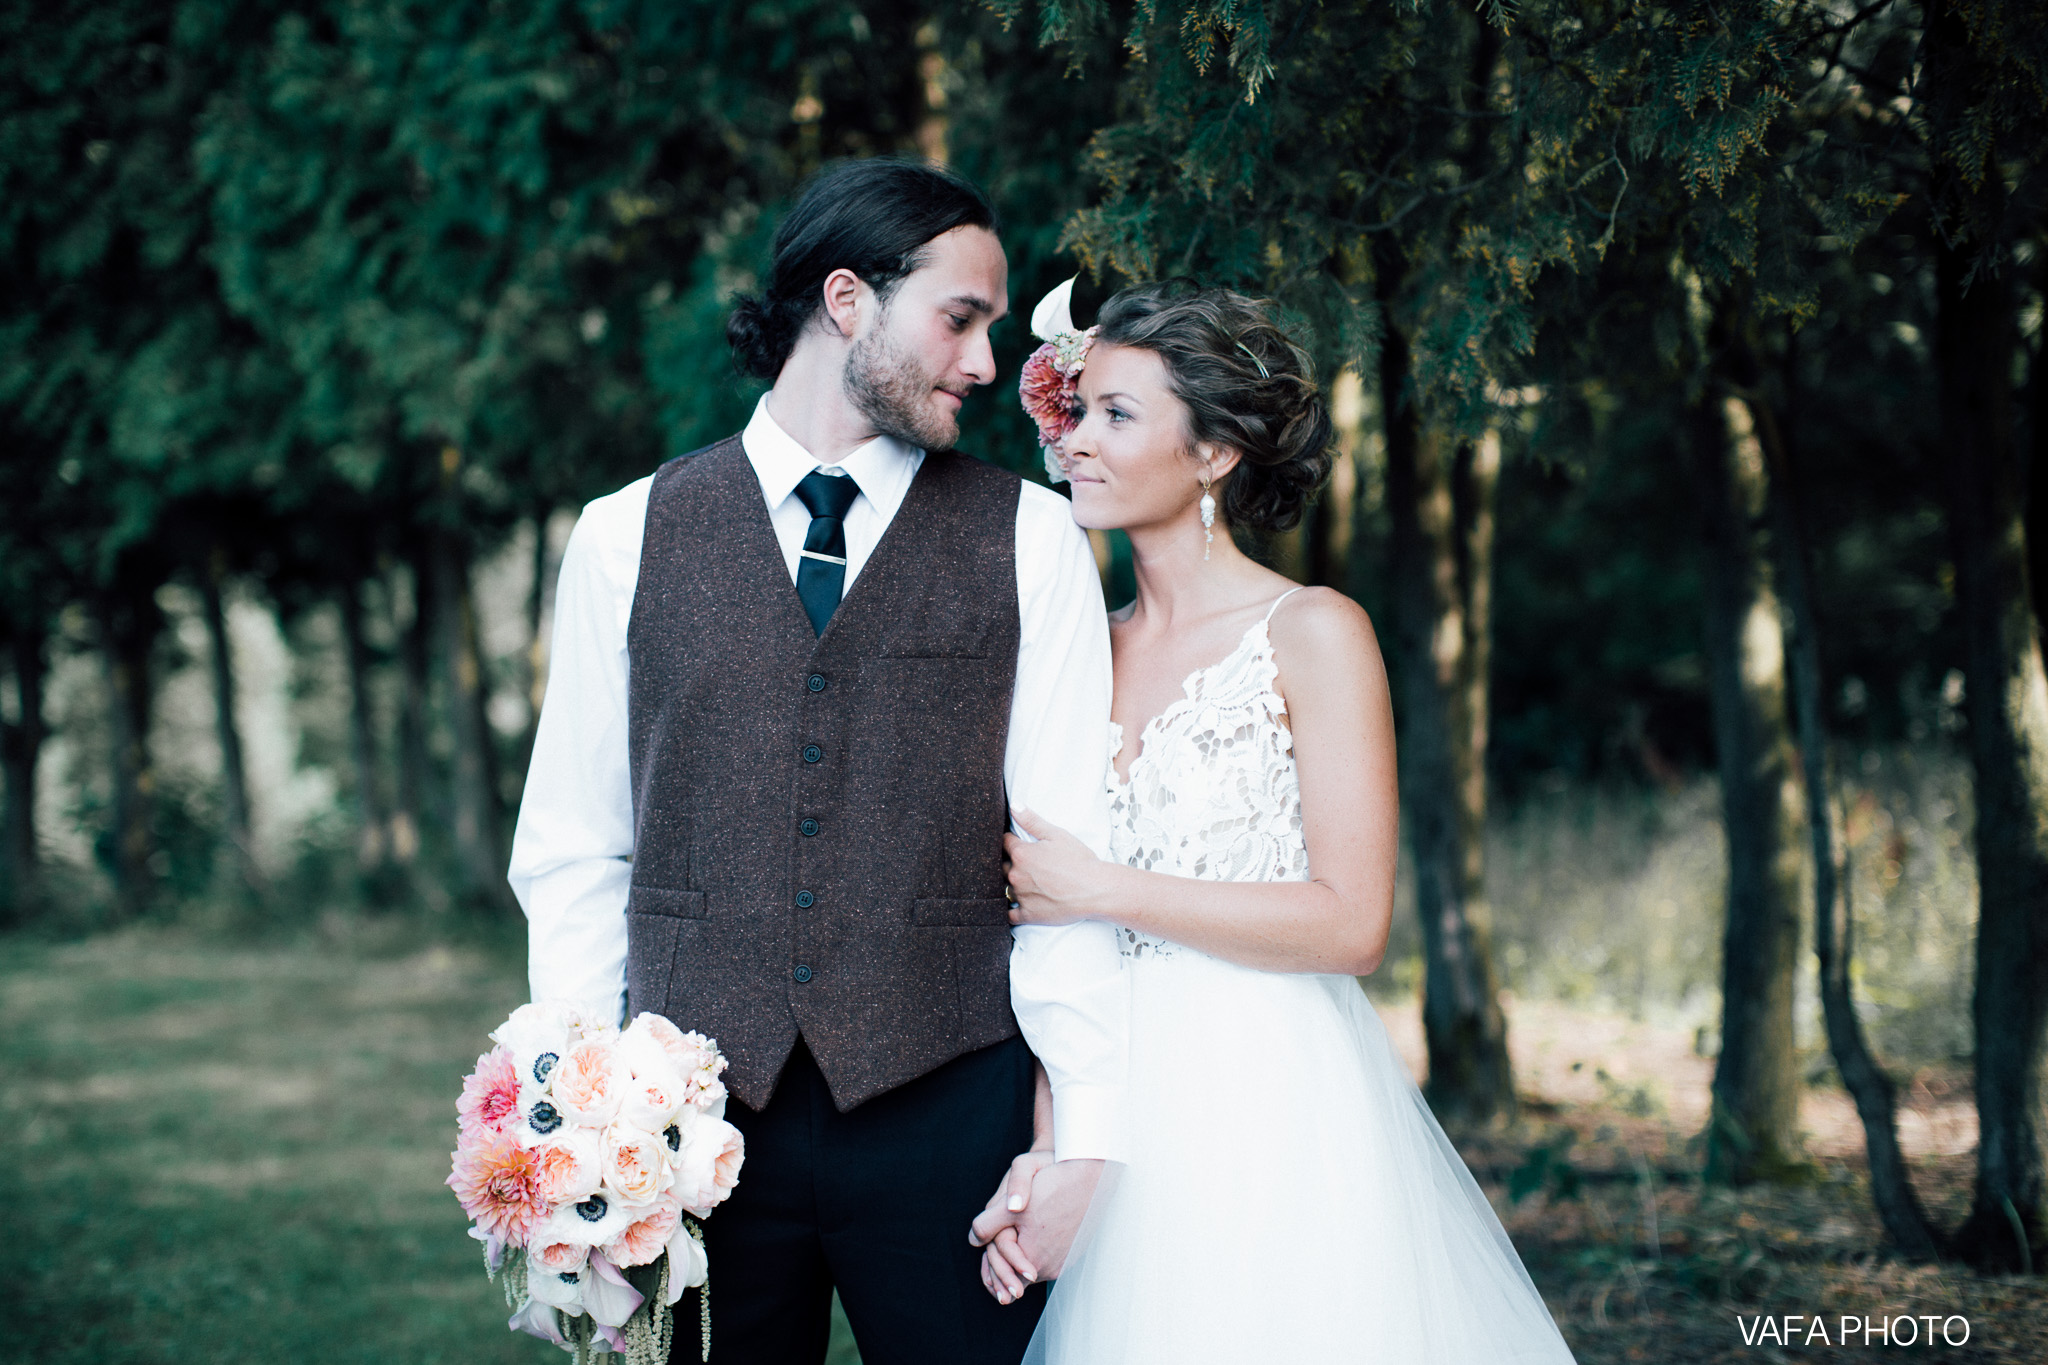 The-Felt-Estate-Wedding-Kailie-David-Vafa-Photo-667.jpg